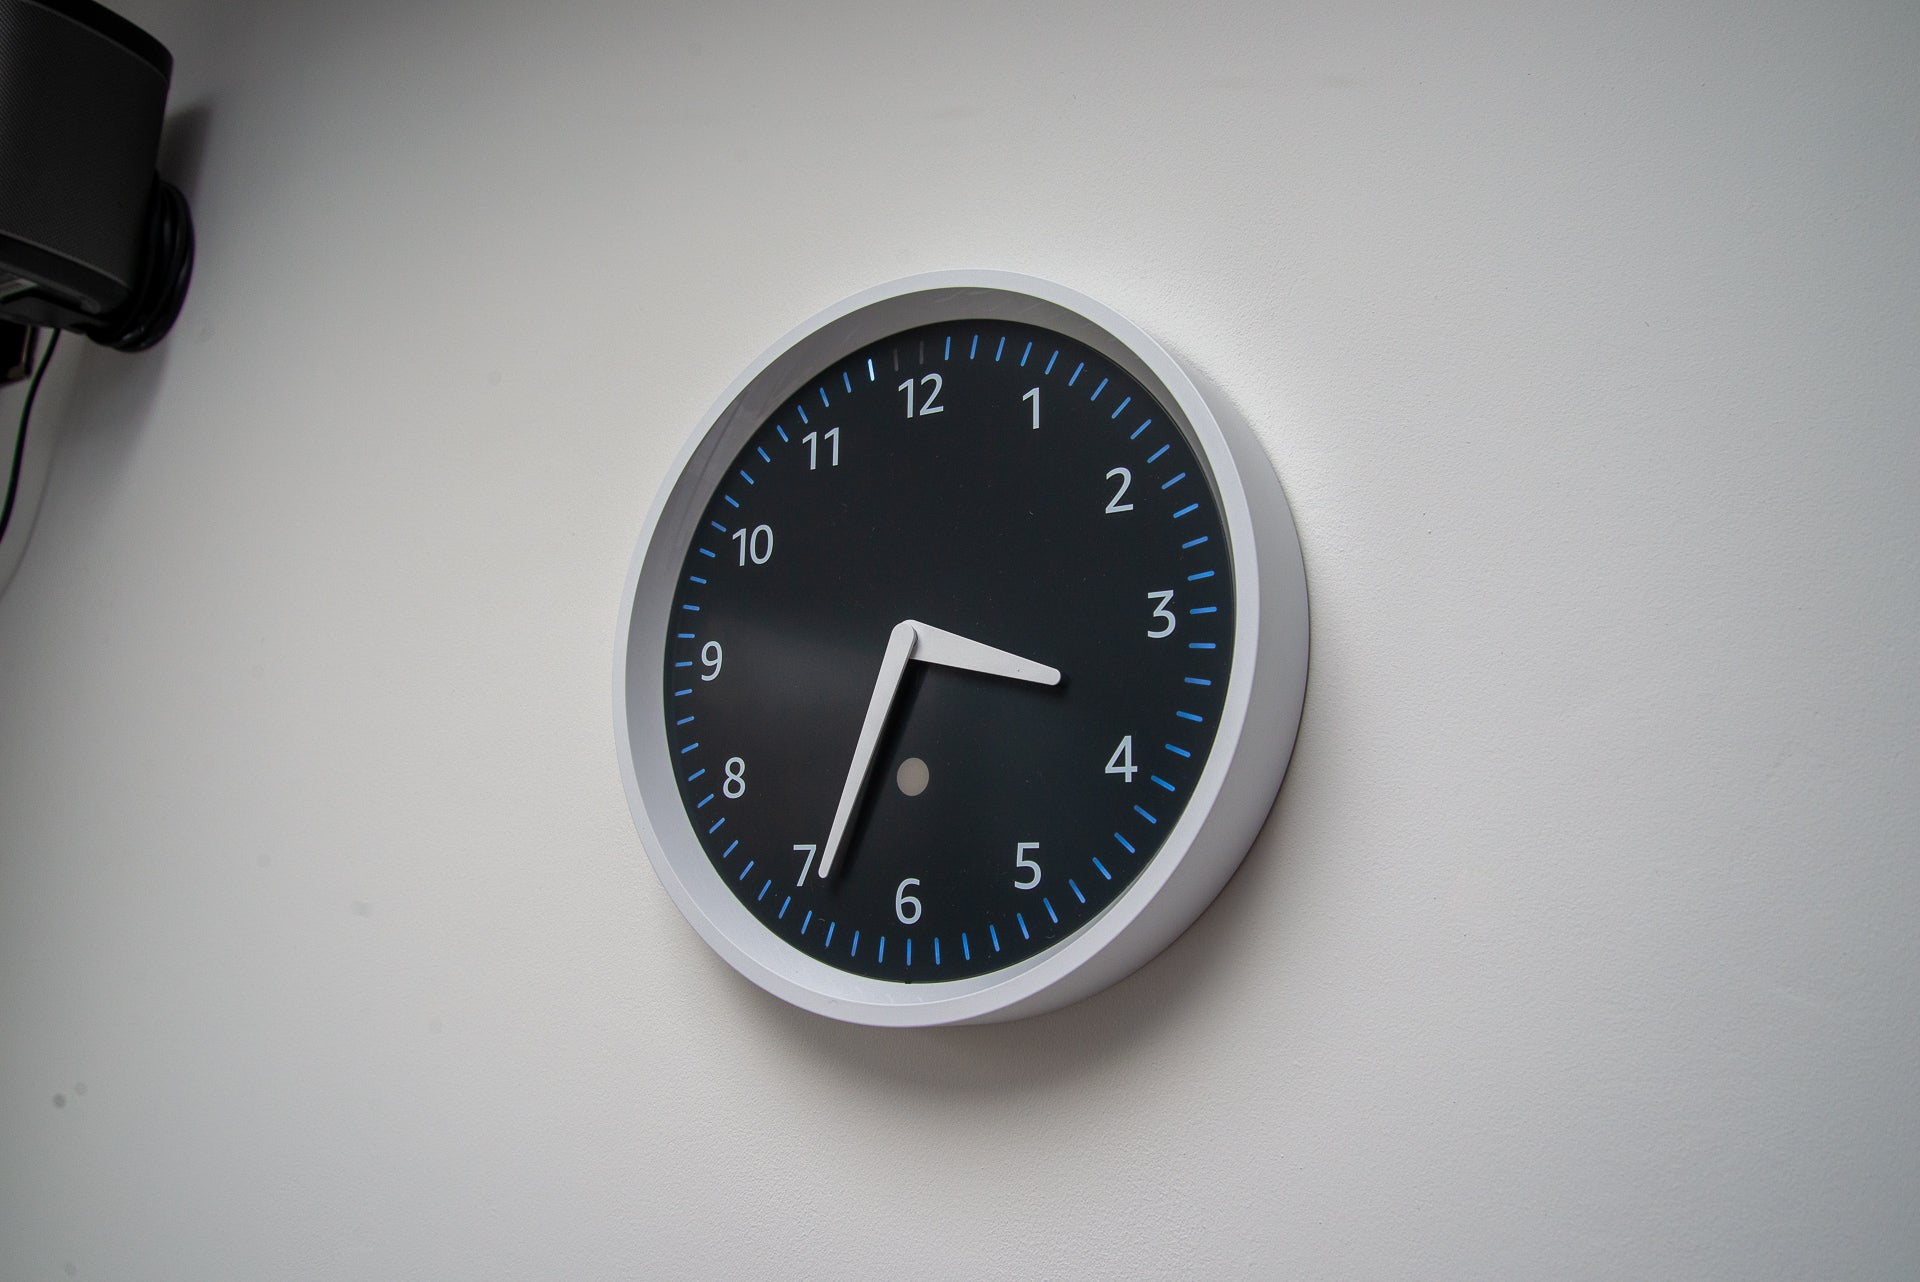 Amazon Echo wall clock counts down 60 seconds